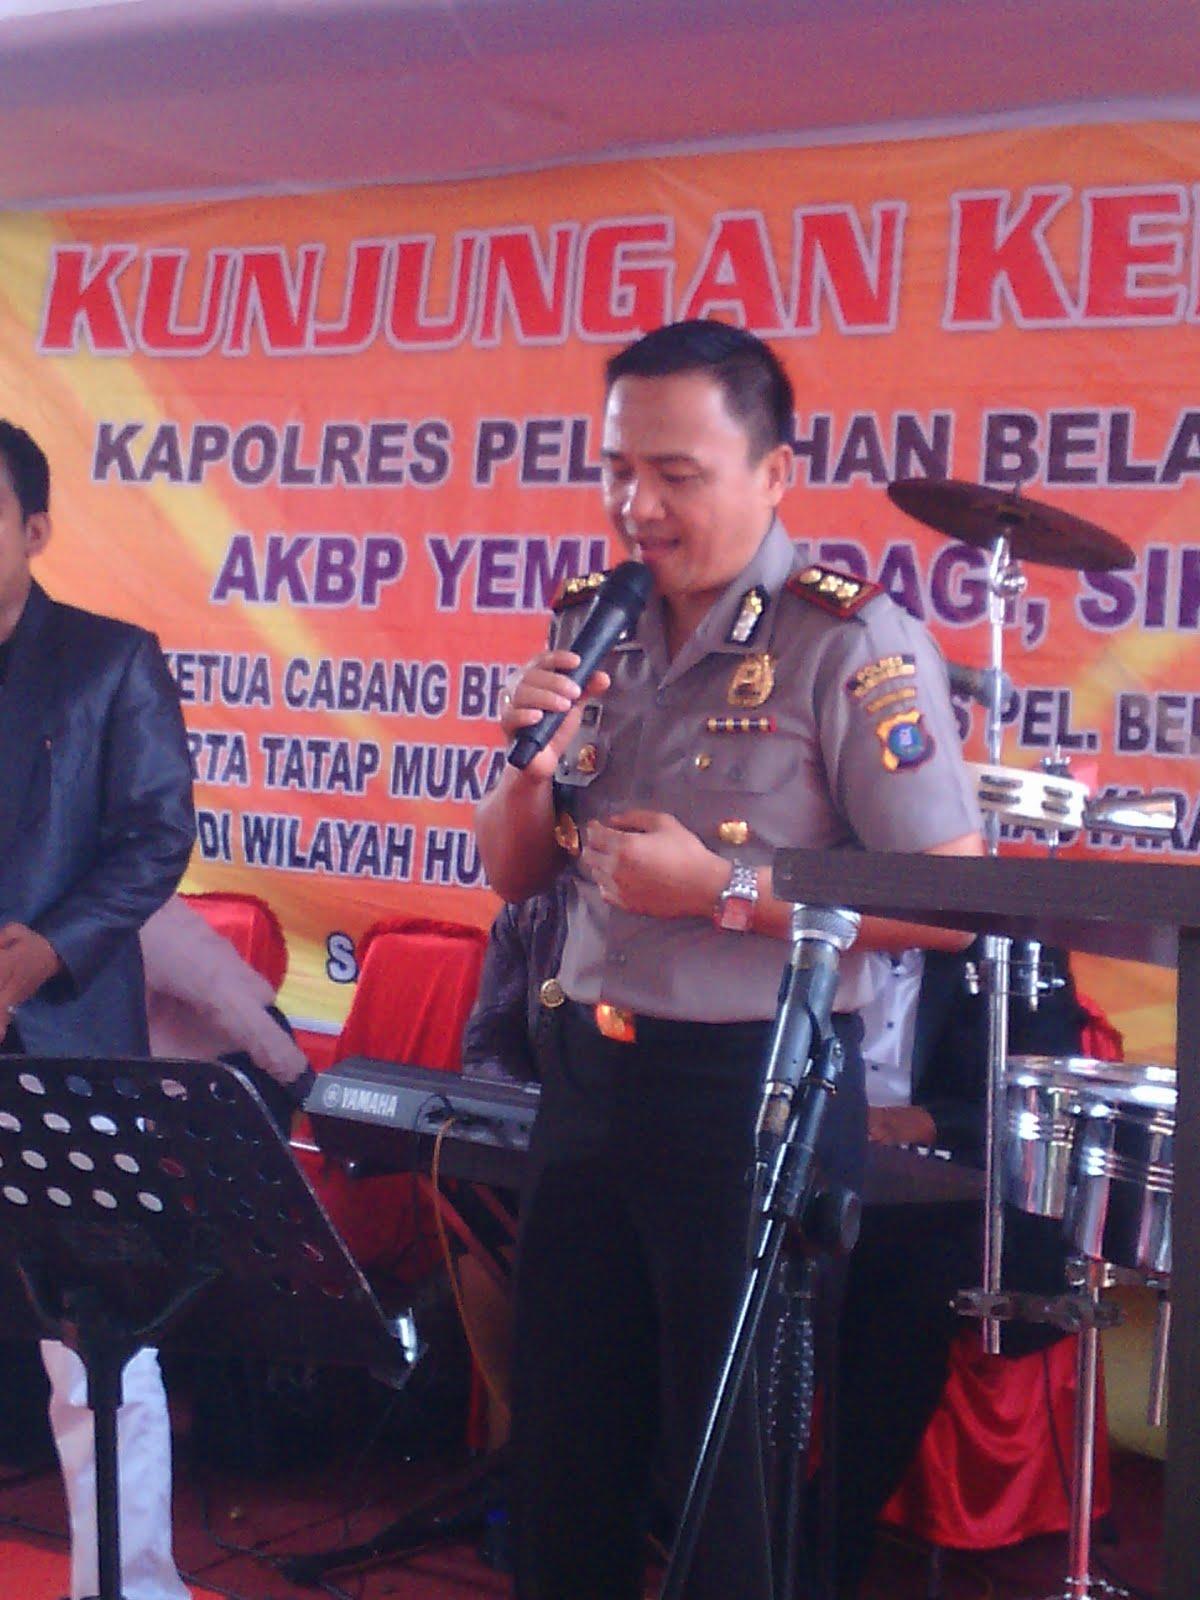 Kapolres Pelabuhan Belawan Kunjungi Polsekta Medan Labuhan